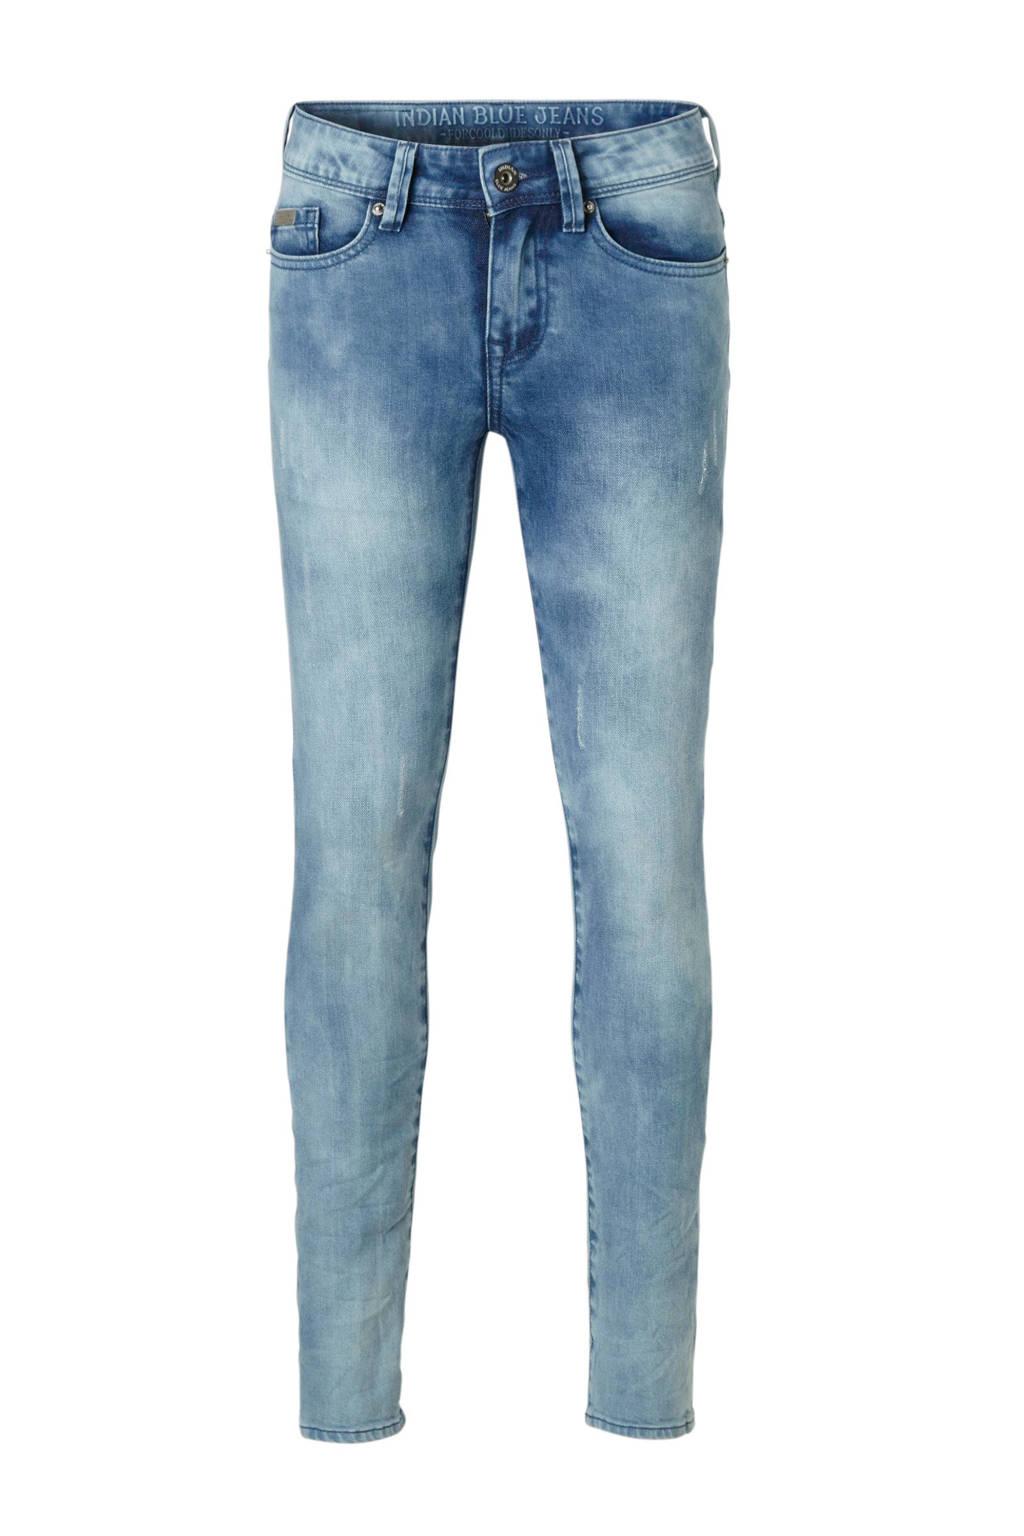 Indian Blue Jeans slim fit jeans Max blauw, Blauw